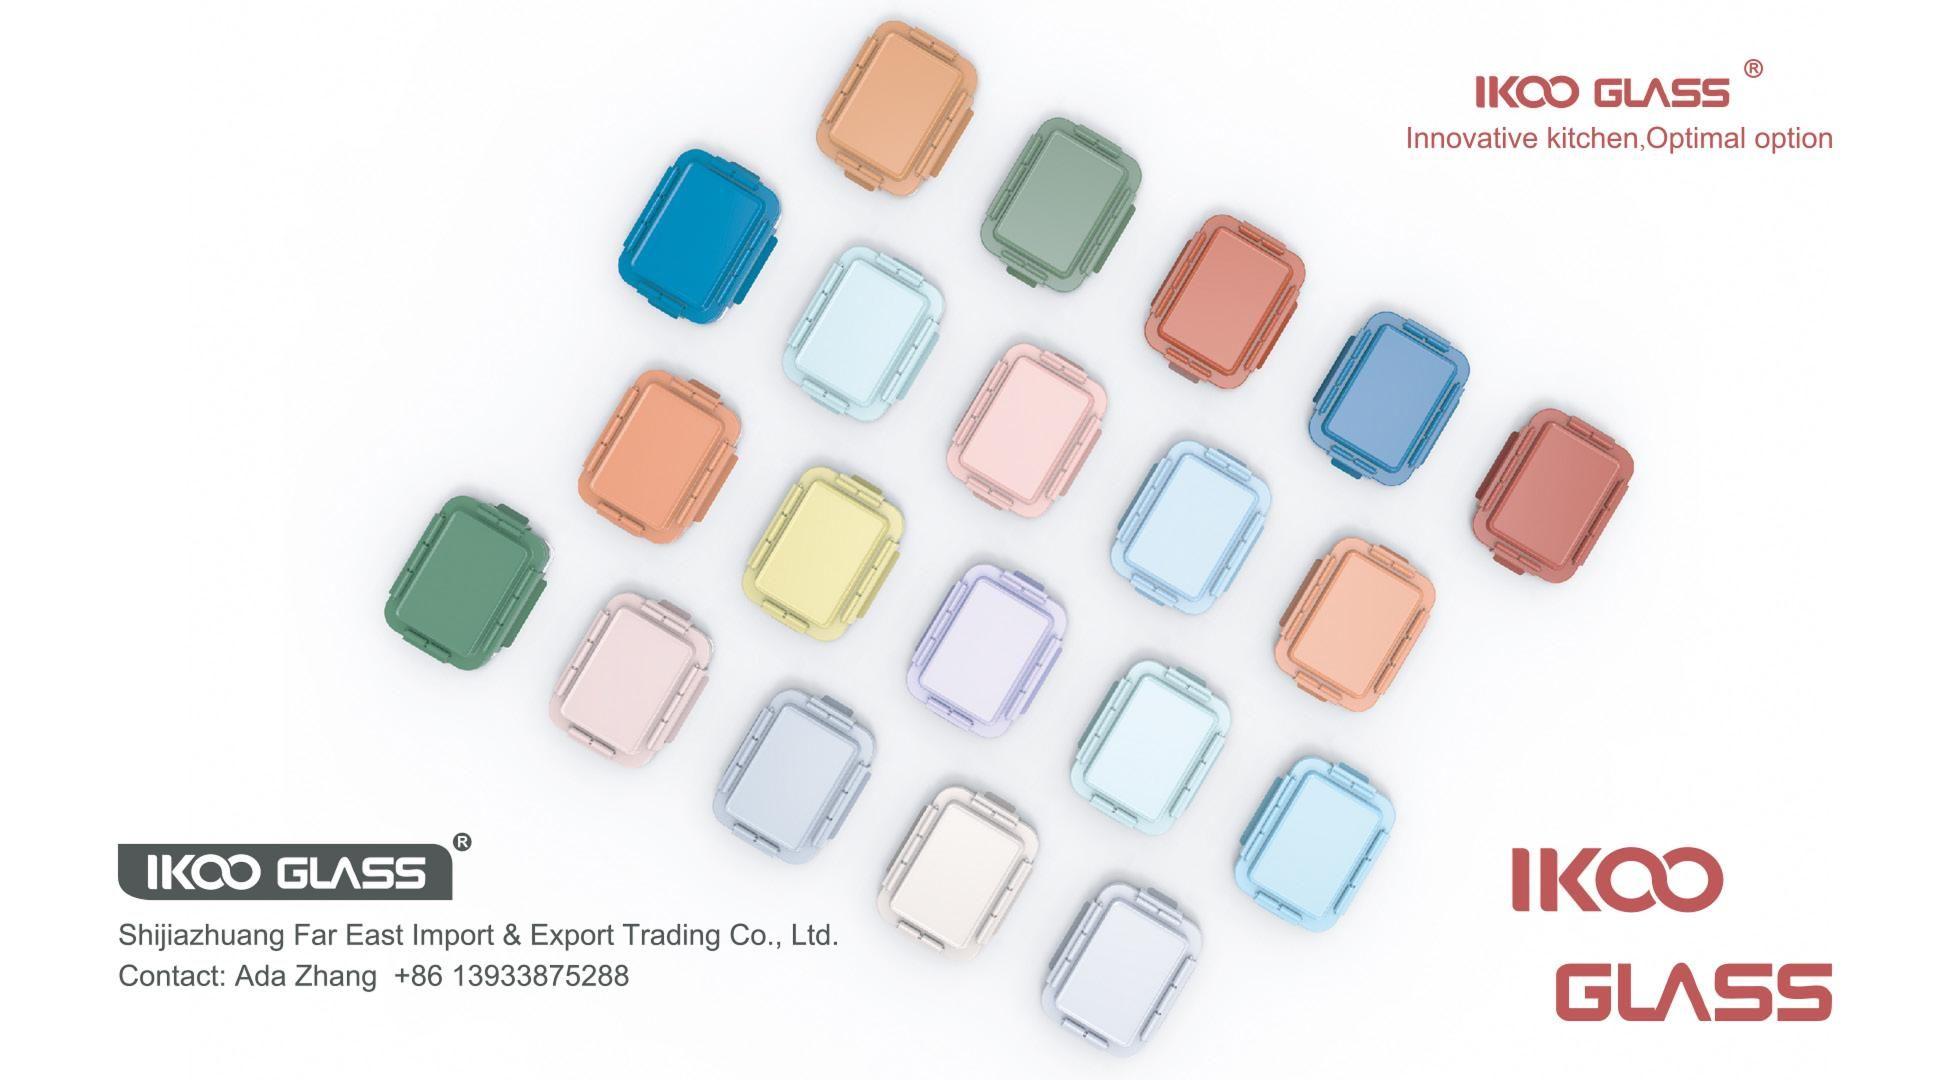 Shijiazhuang Far East Import & Export Trading Co.,Ltd